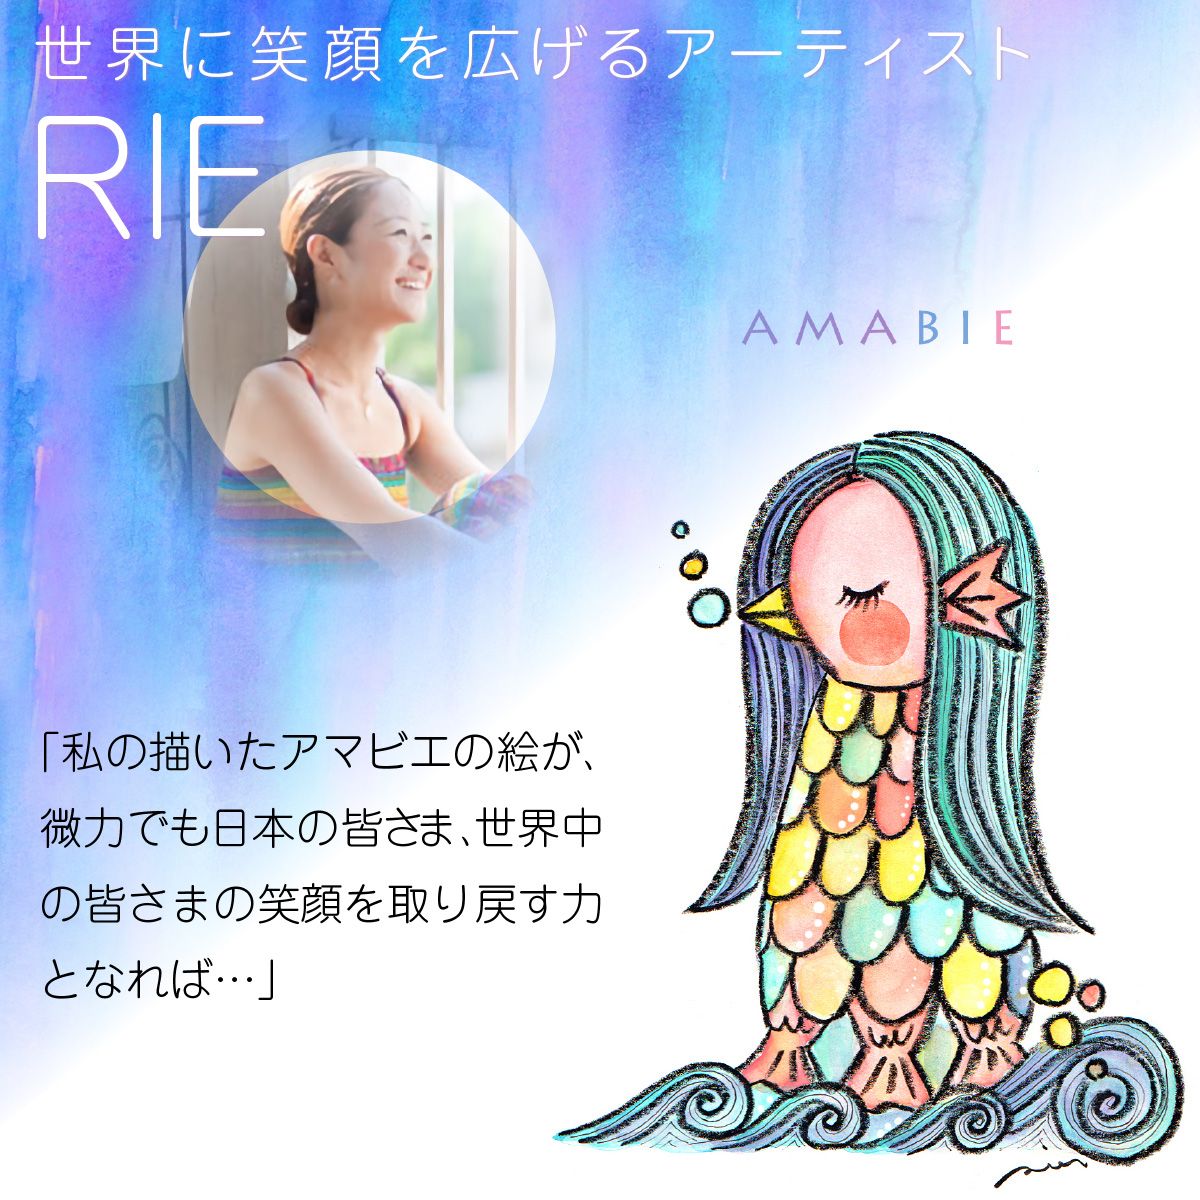 RIEの『AMABIE』 ≫疫病退散!?妖怪アマビエの開運アート